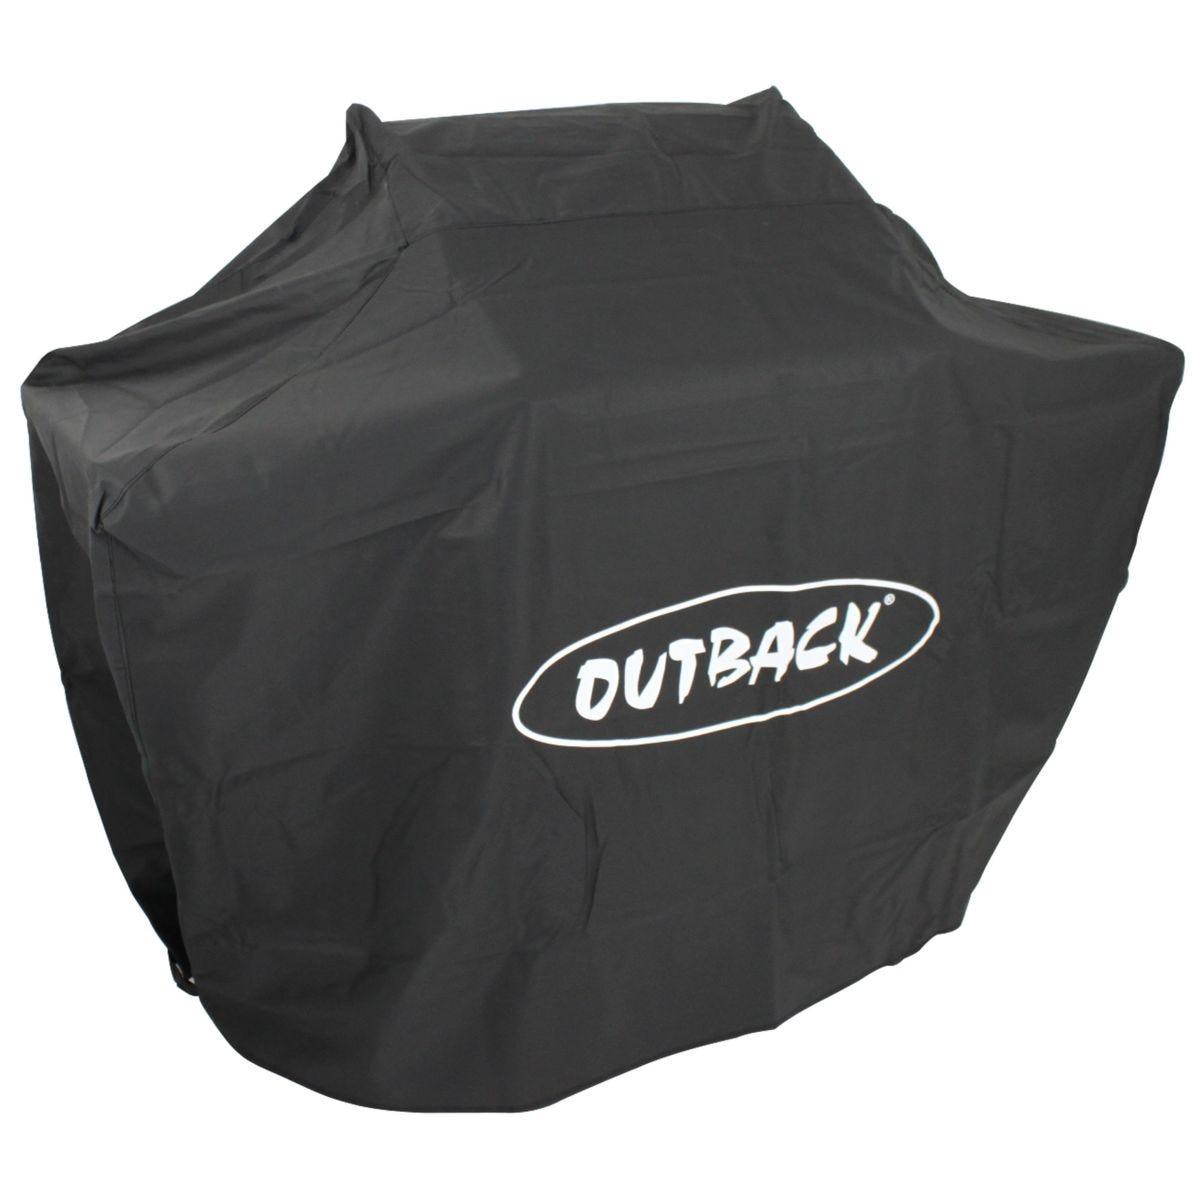 Outback Hunter/Spectrum 3-Burner Hooded BBQ Cover